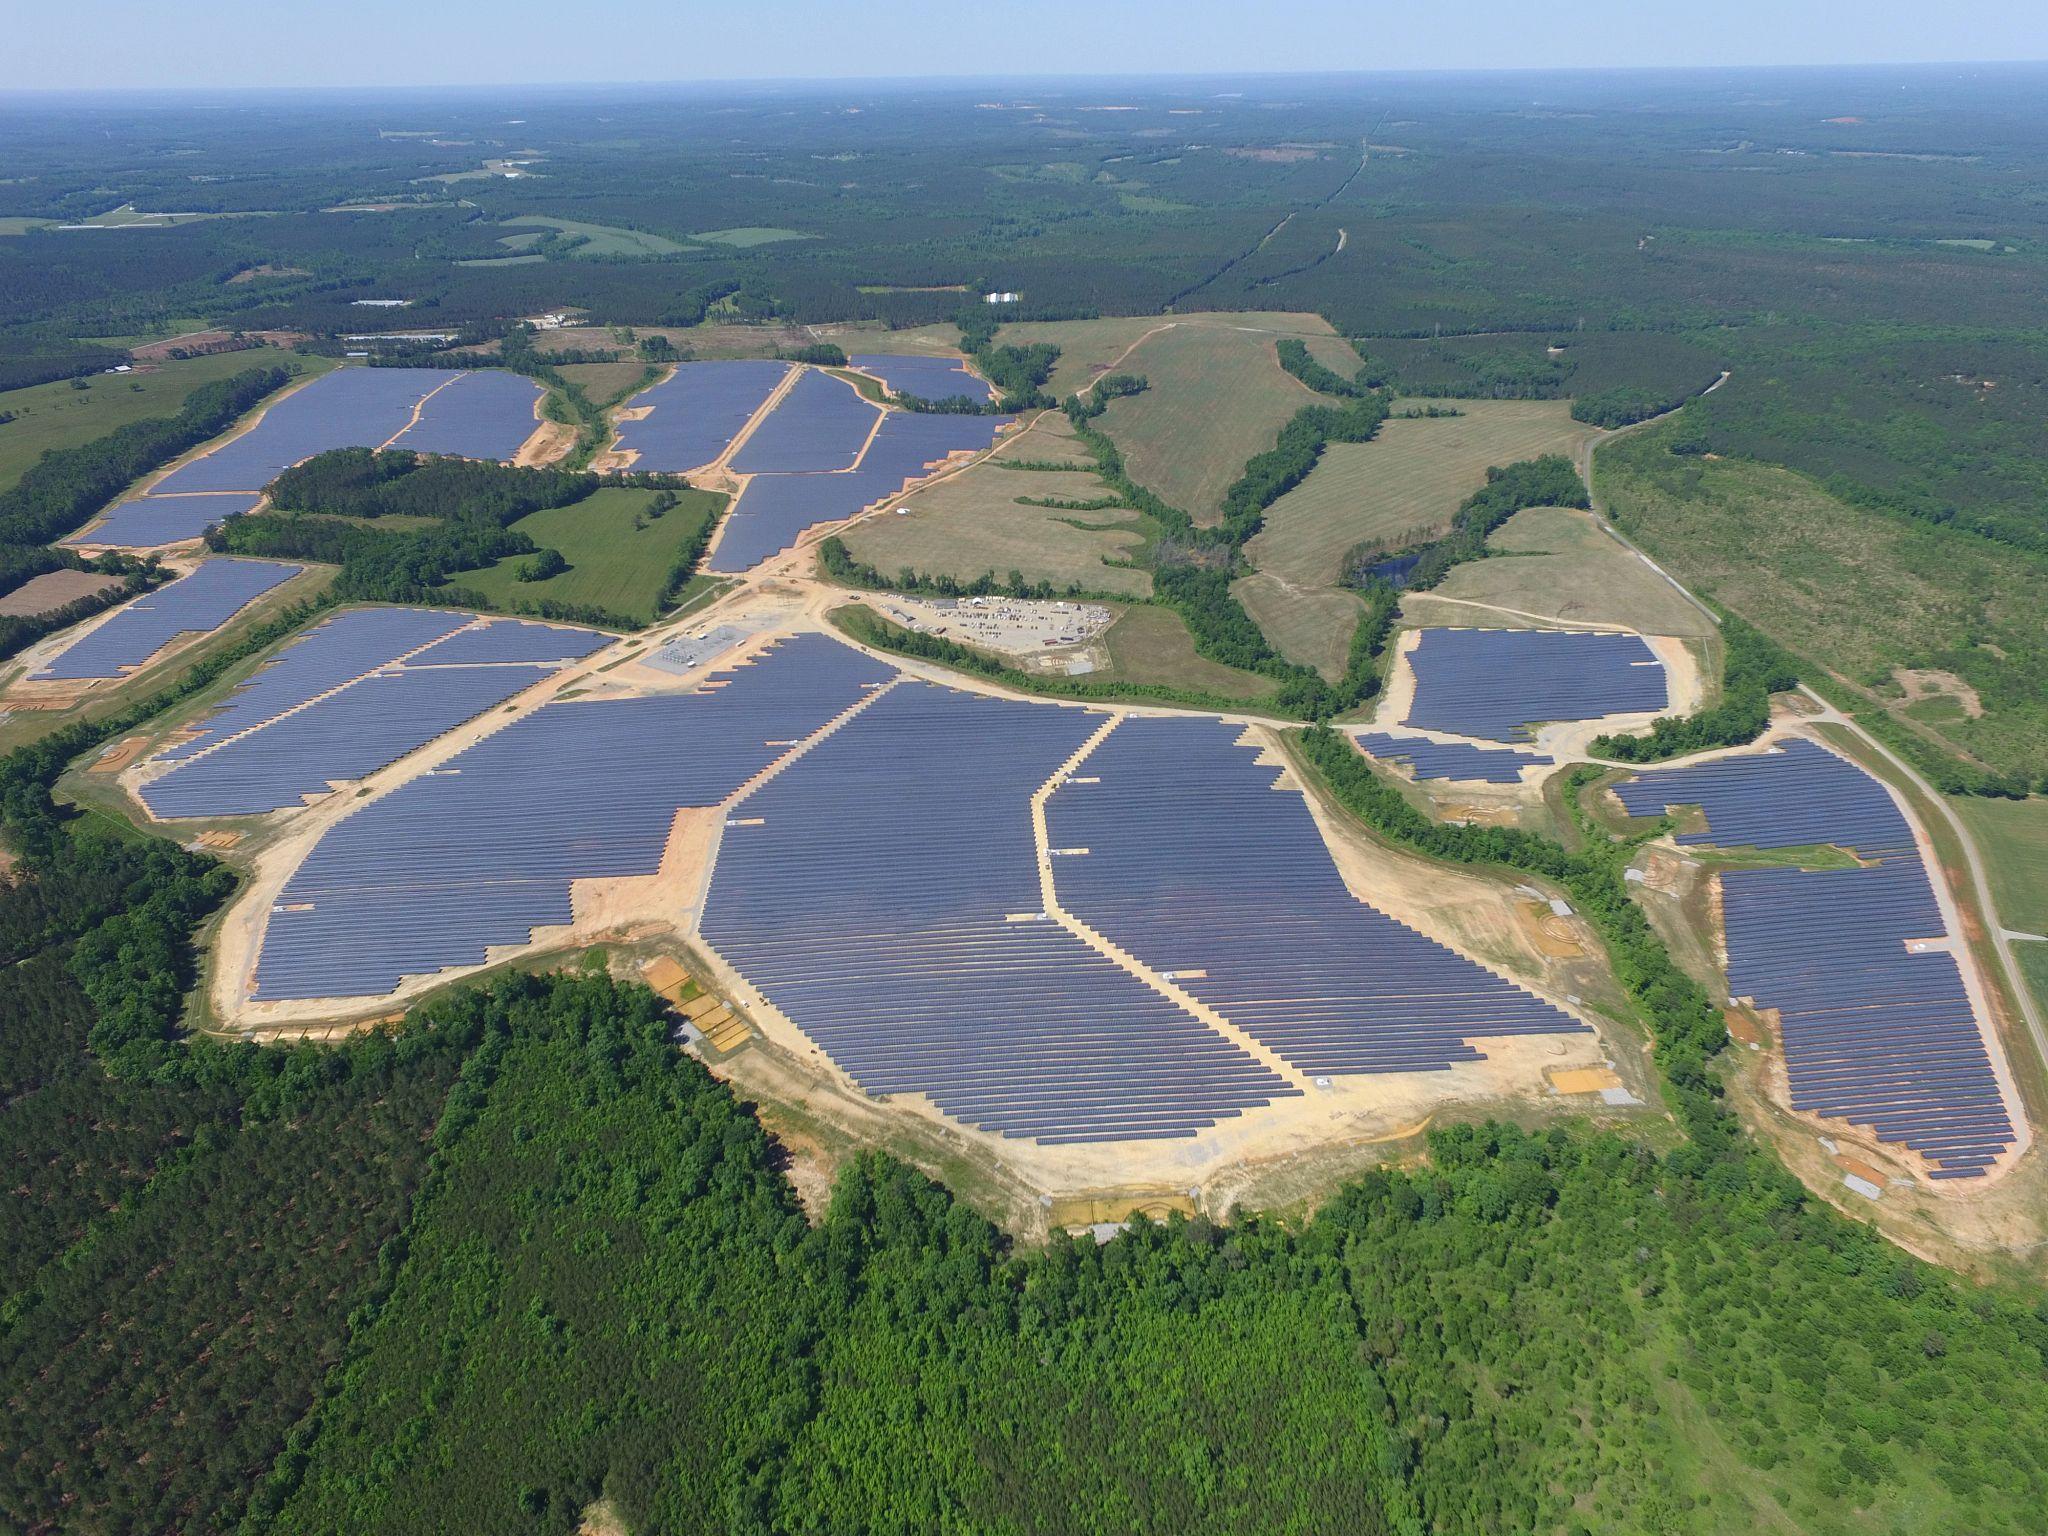 IS 37 Solar Farm